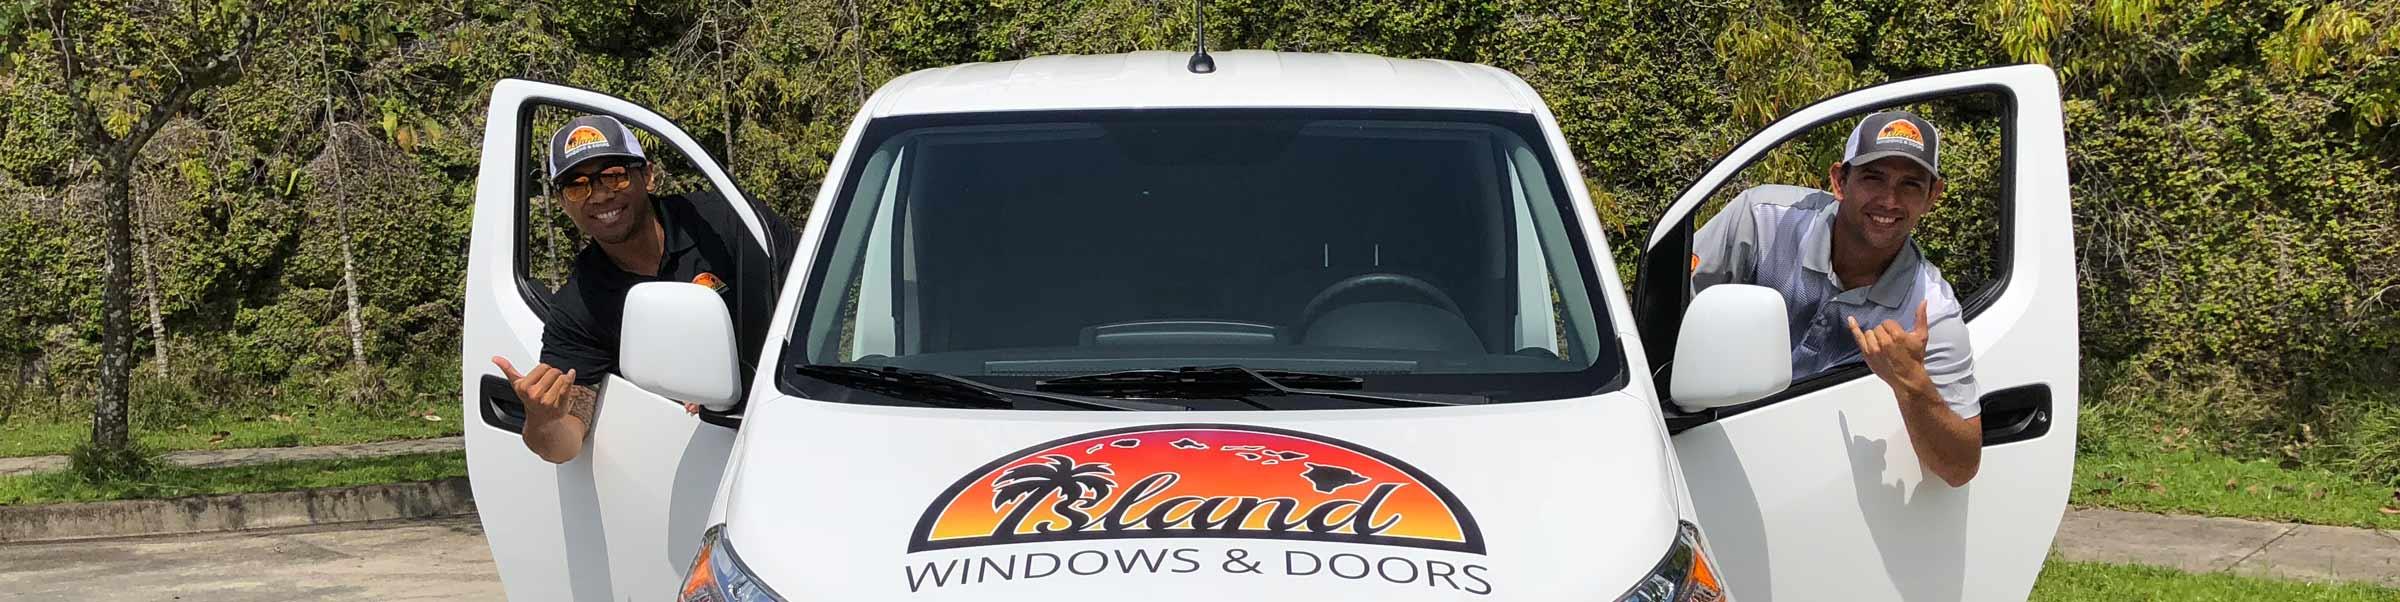 Island windows and doors team